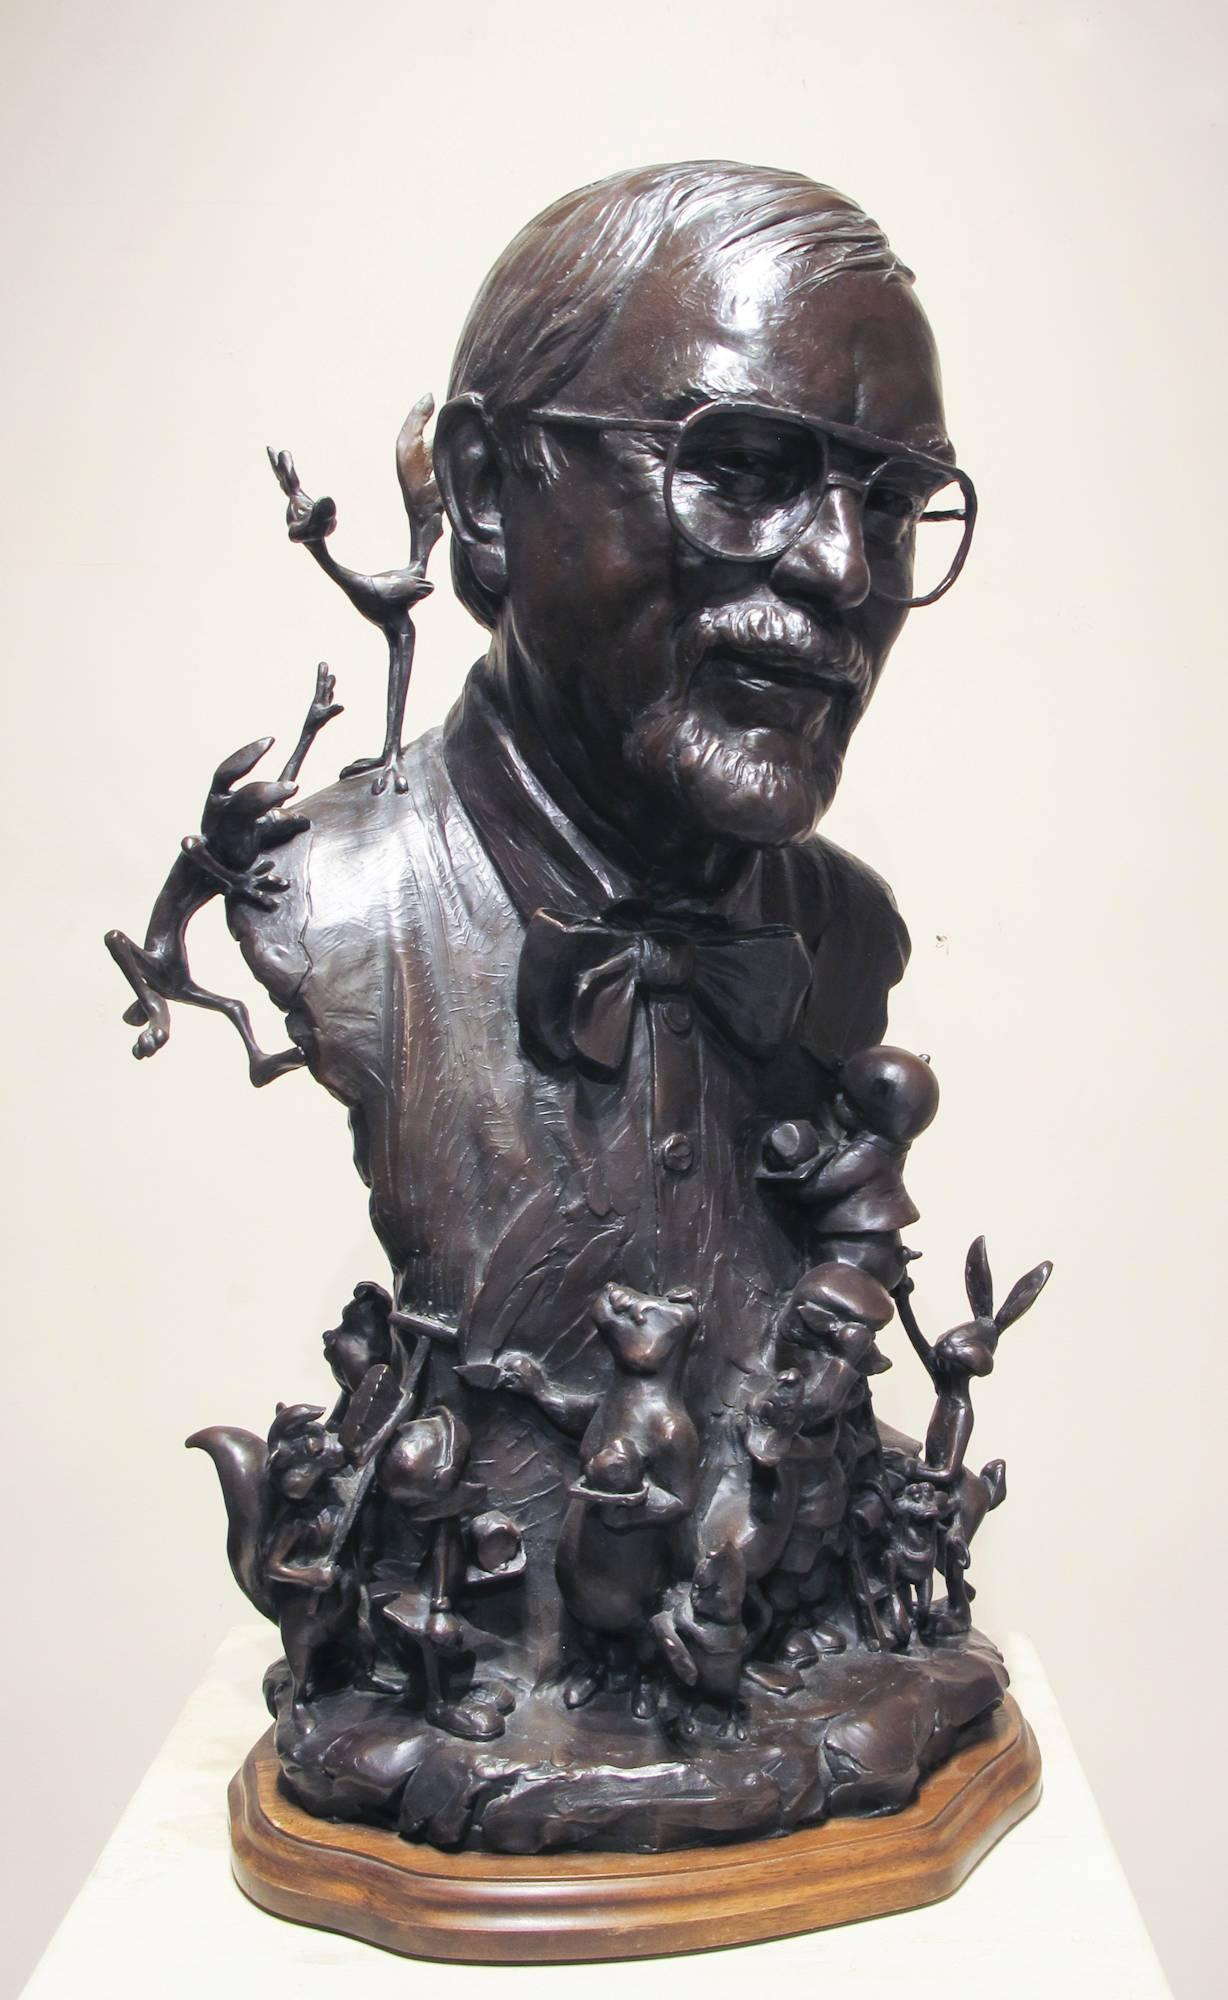 Chuck Jones, bronze portrait, Bugs Bunny, Roadrunner,Marvin the Martian PorkyPig